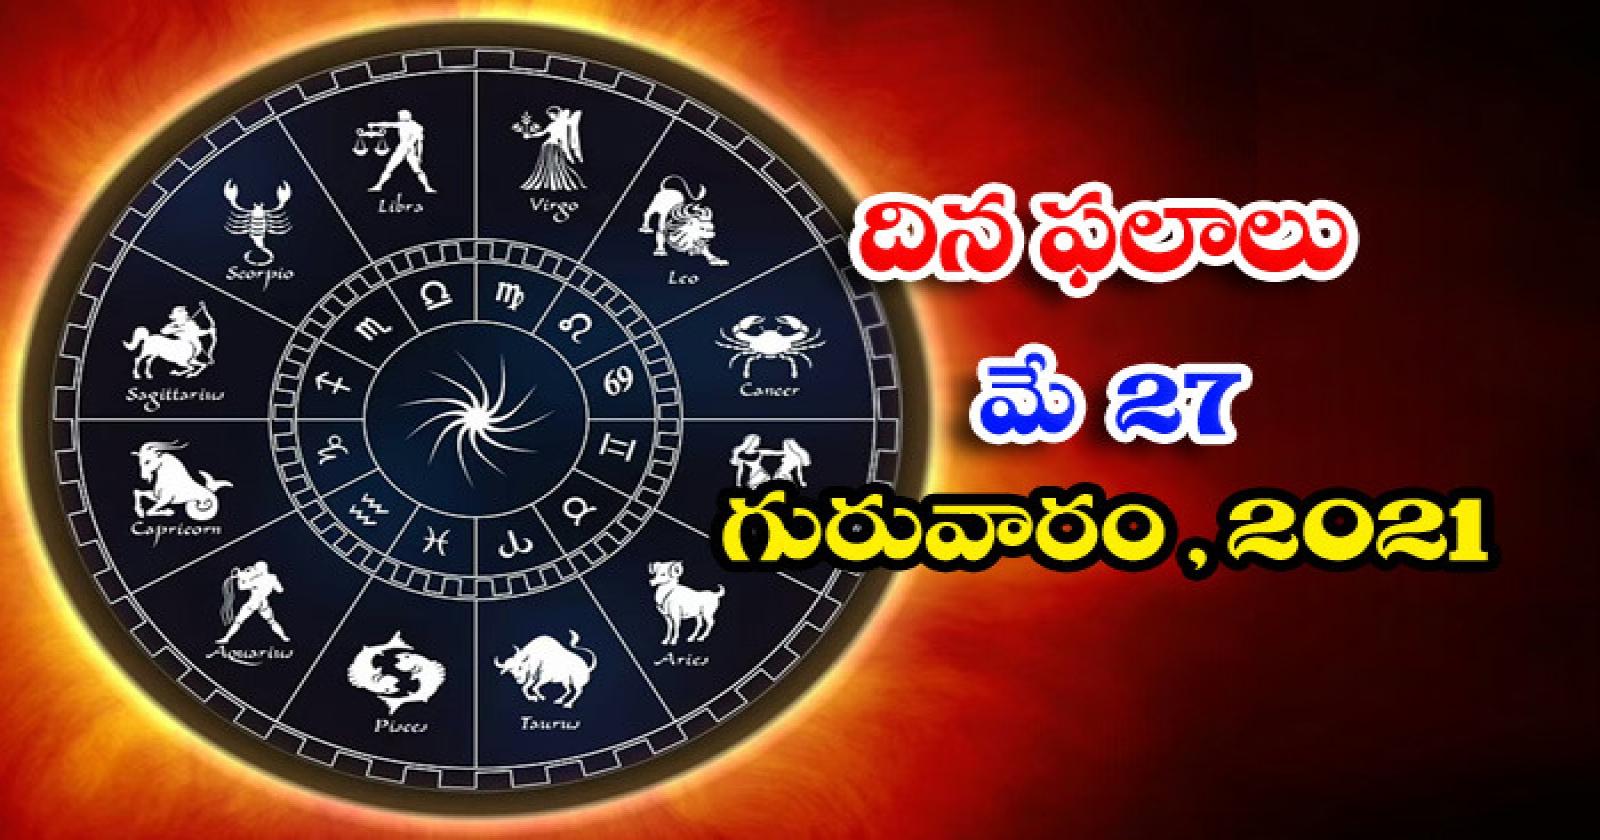 Telugu Daily Astrology Prediction Rasi Phalalu May 27 Thursday 2021-తెలుగు రాశి ఫలాలు, పంచాంగం – మే 27, గురువారం, 2021-Latest News - Telugu-Telugu Tollywood Photo Image-TeluguStop.com